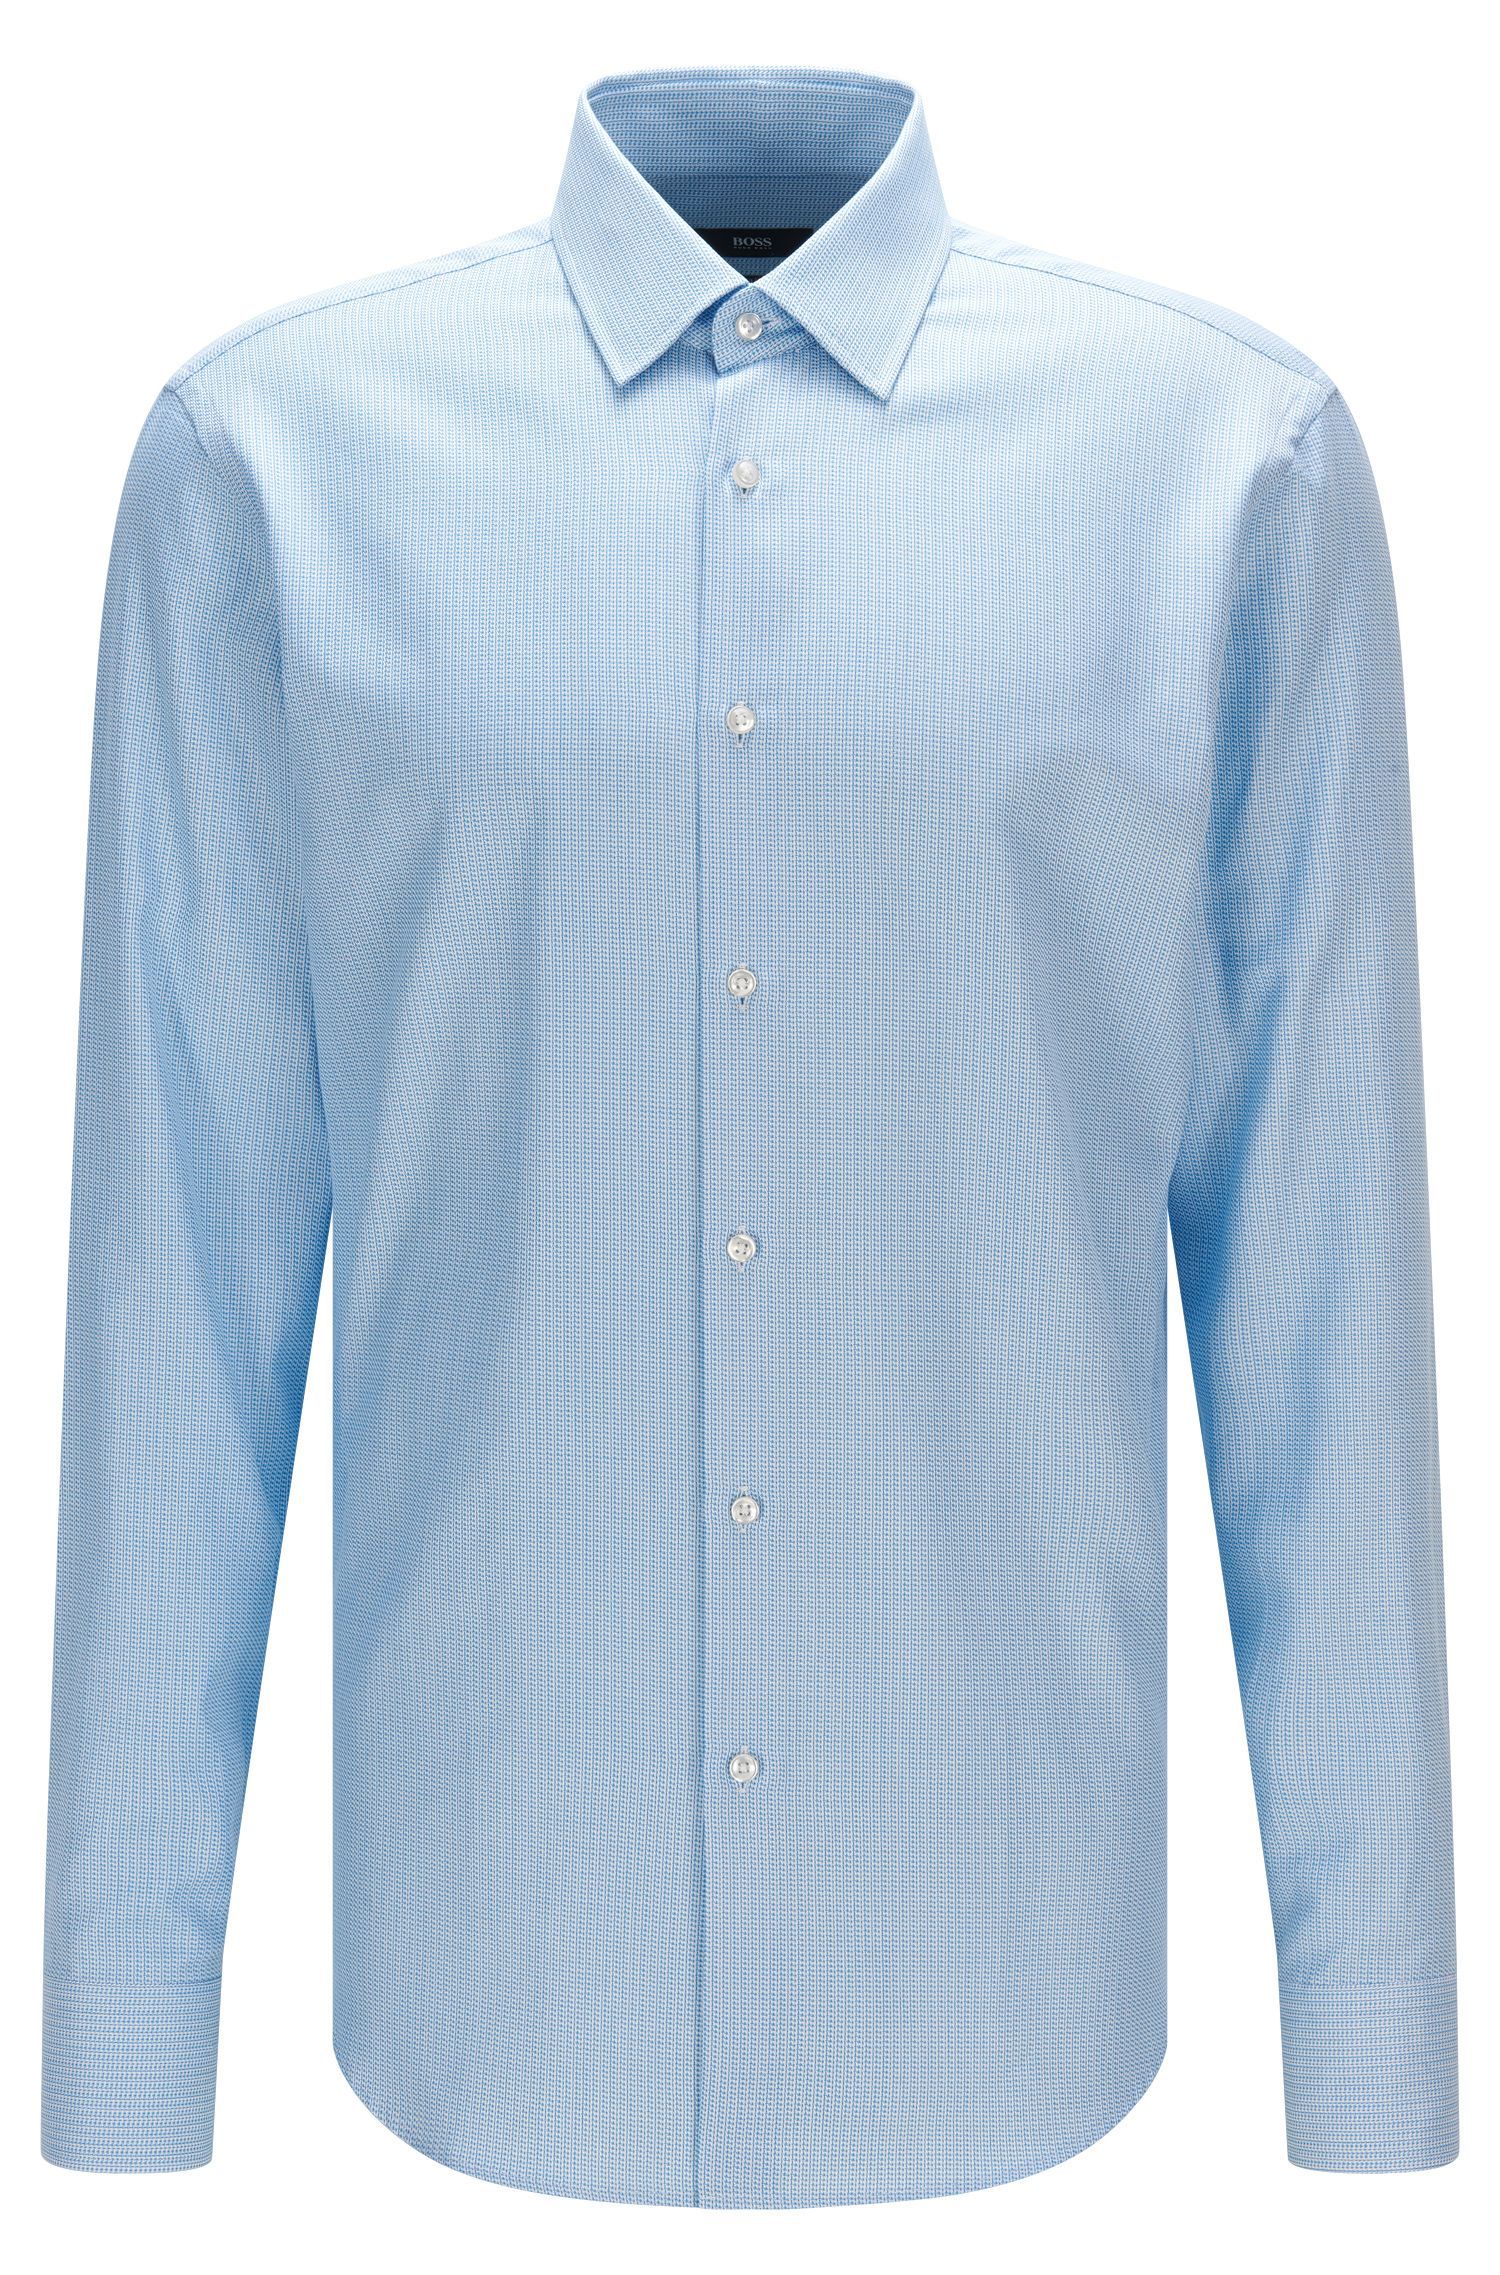 Dobby Italian Cotton Dress Shirt, Regular fit | Enzo